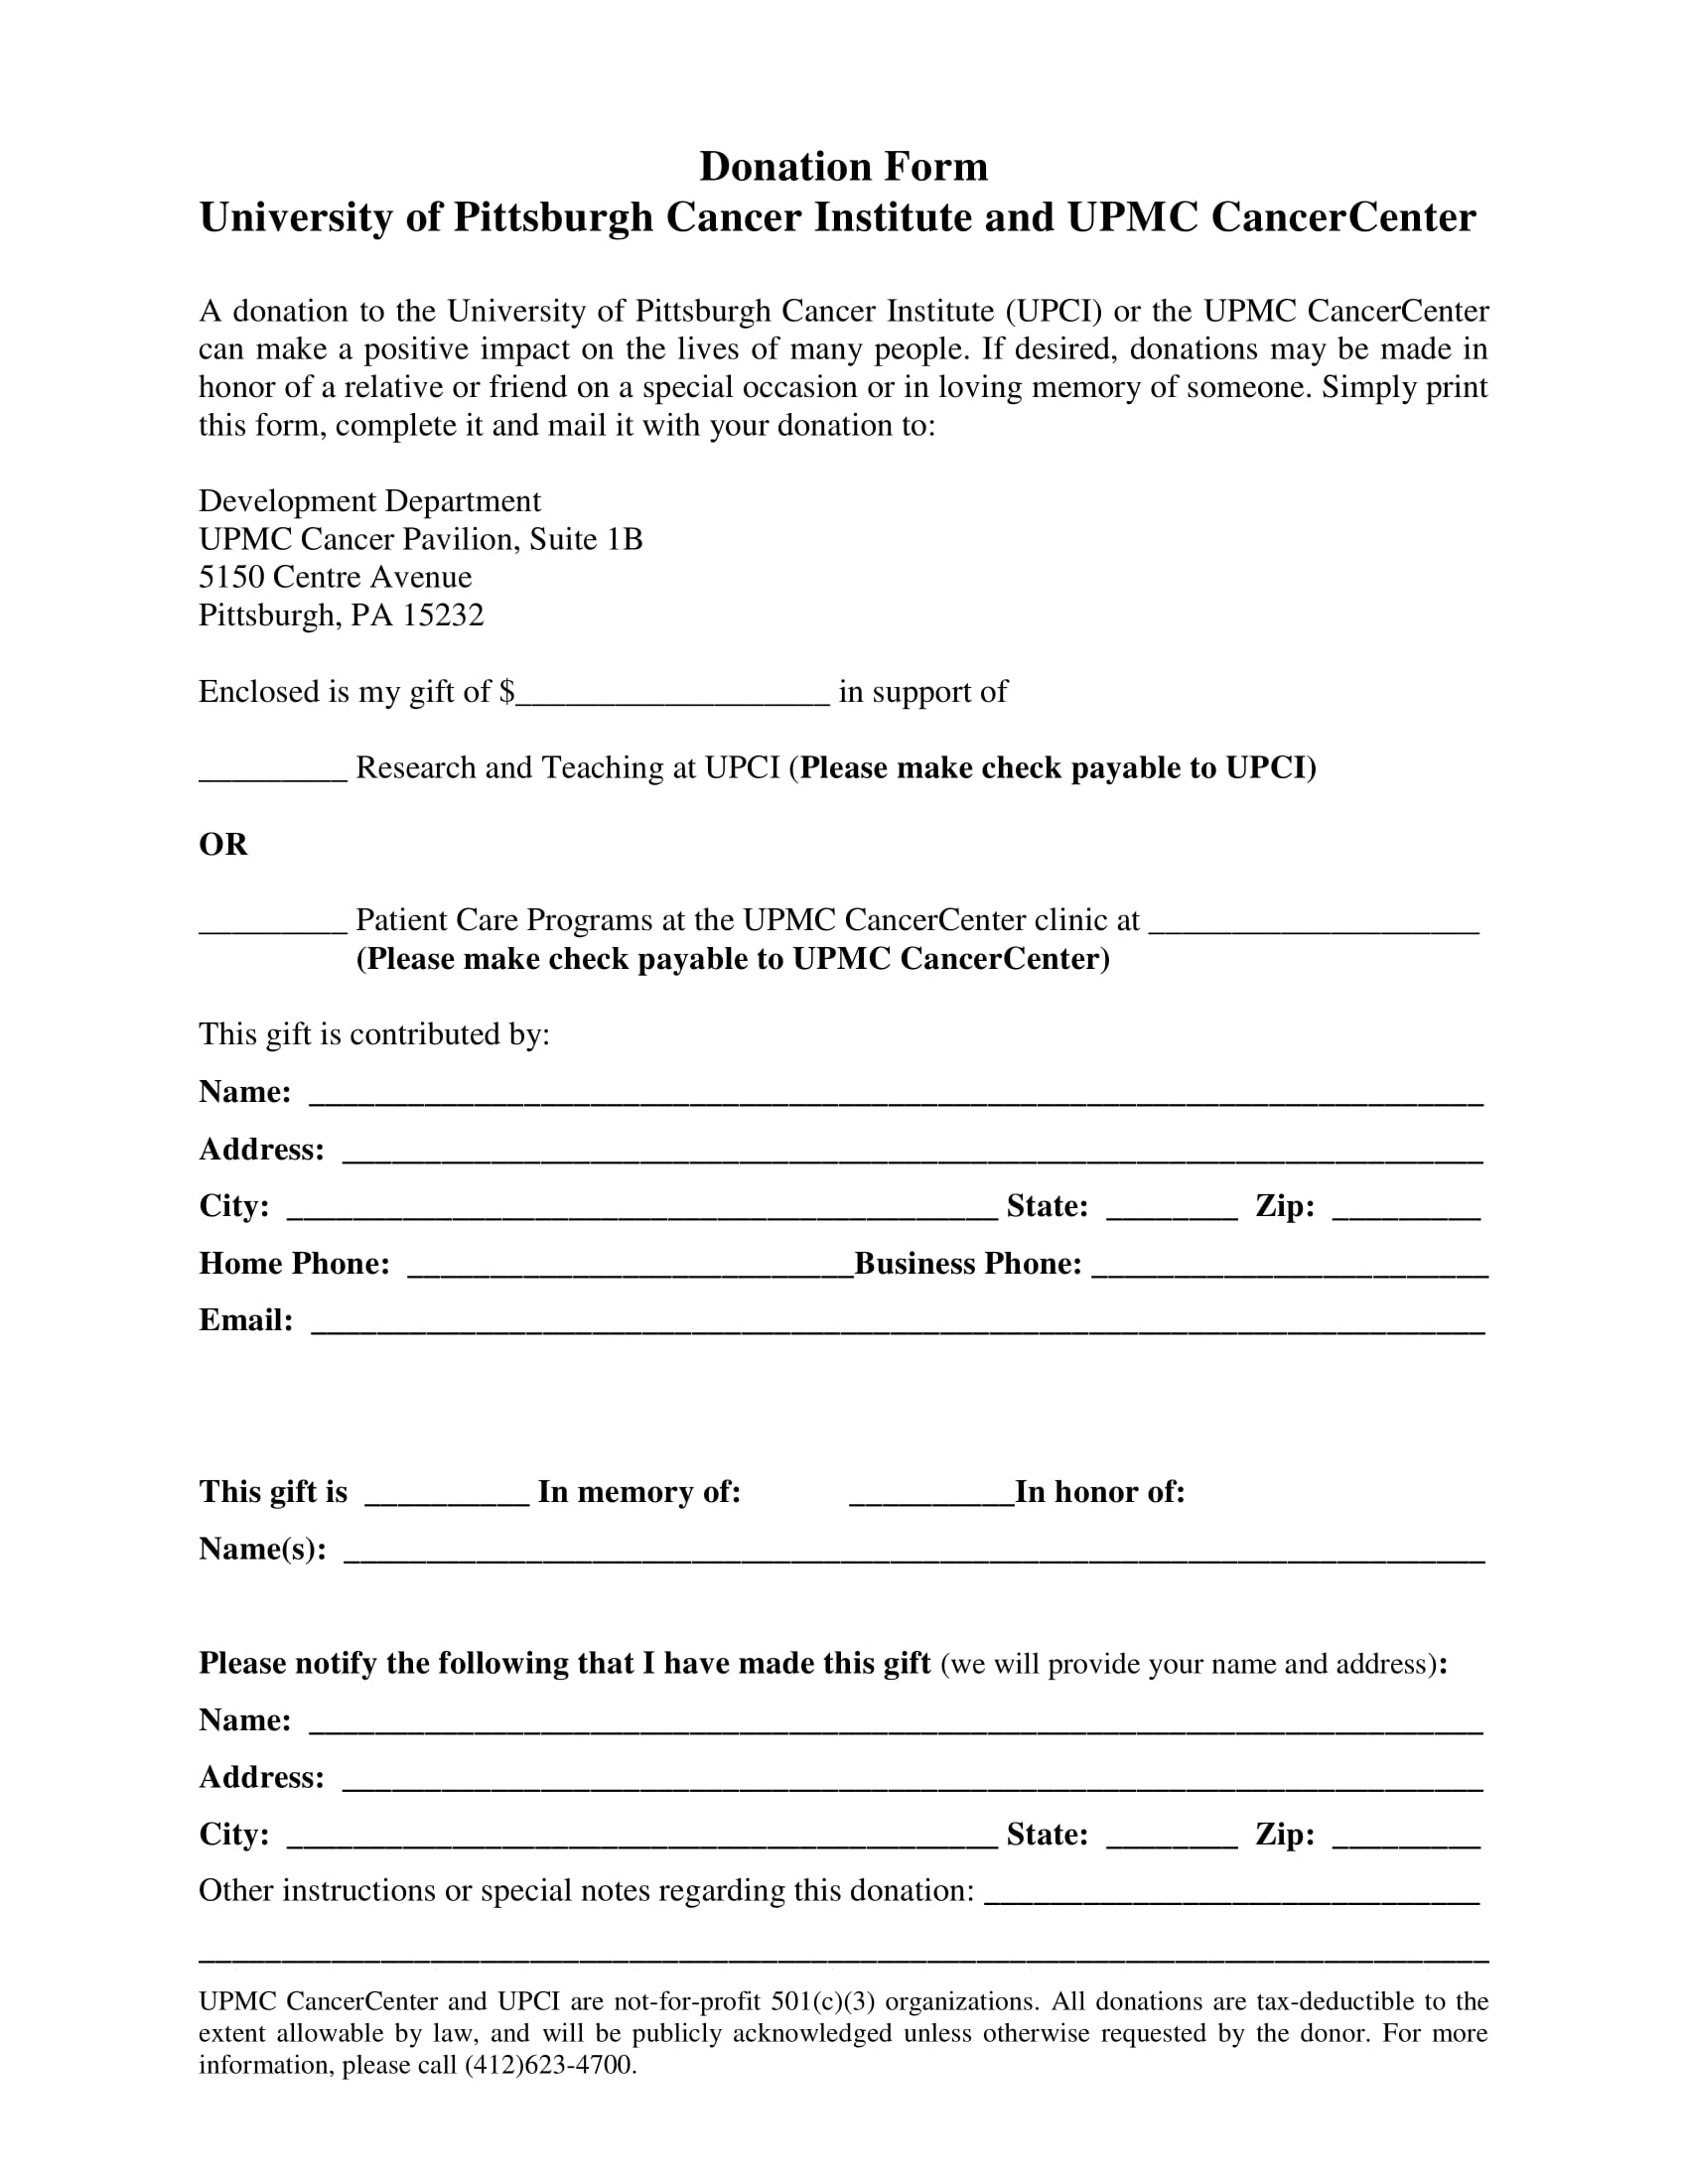 cancer center donation form 1